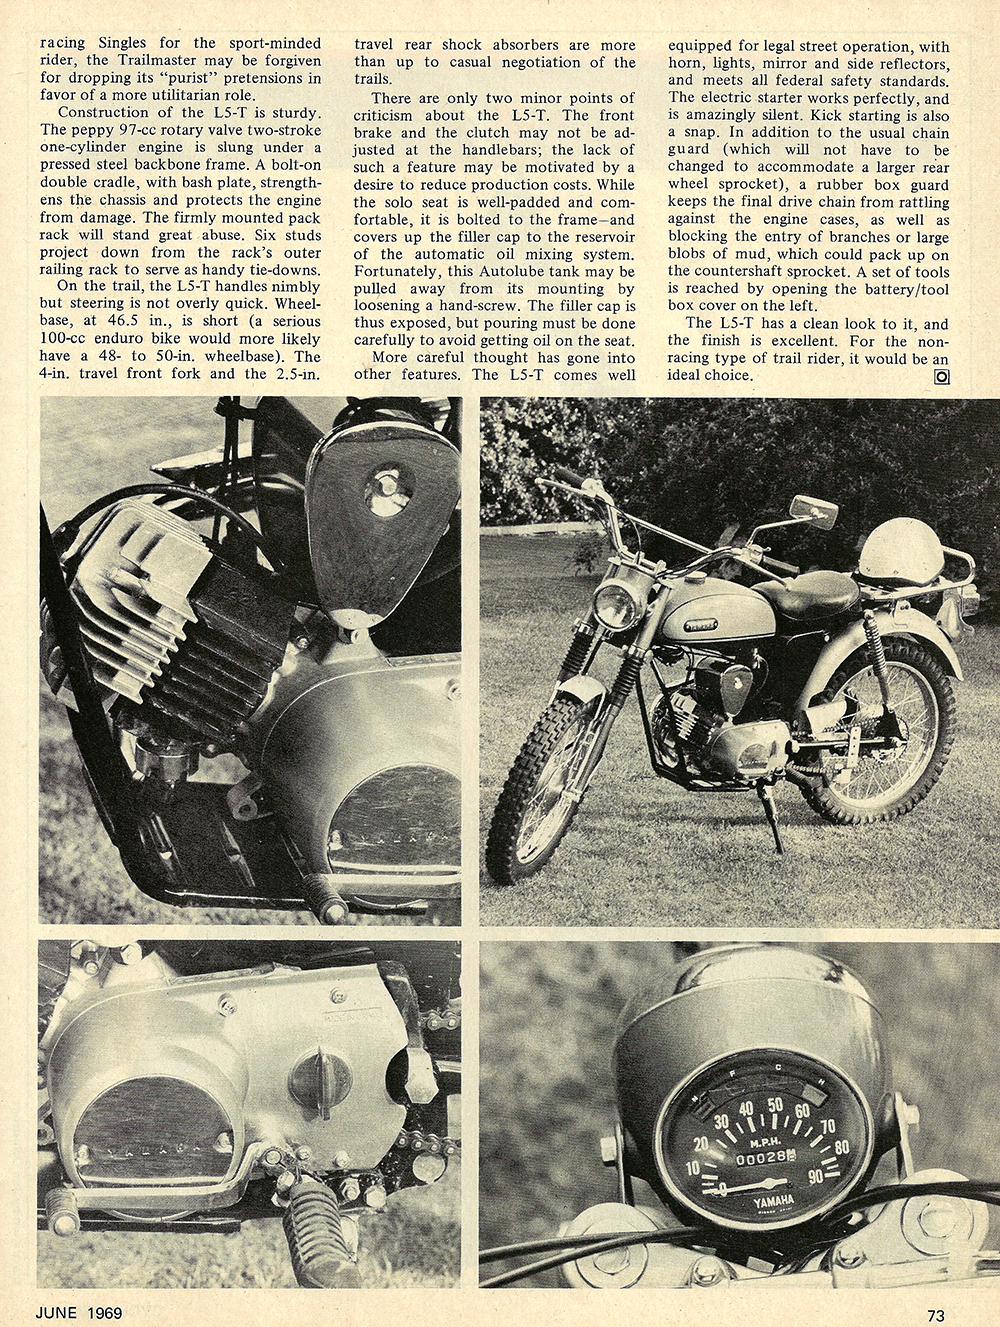 1969 Yamaha L5T Trailmaster 100 road test 02.jpg